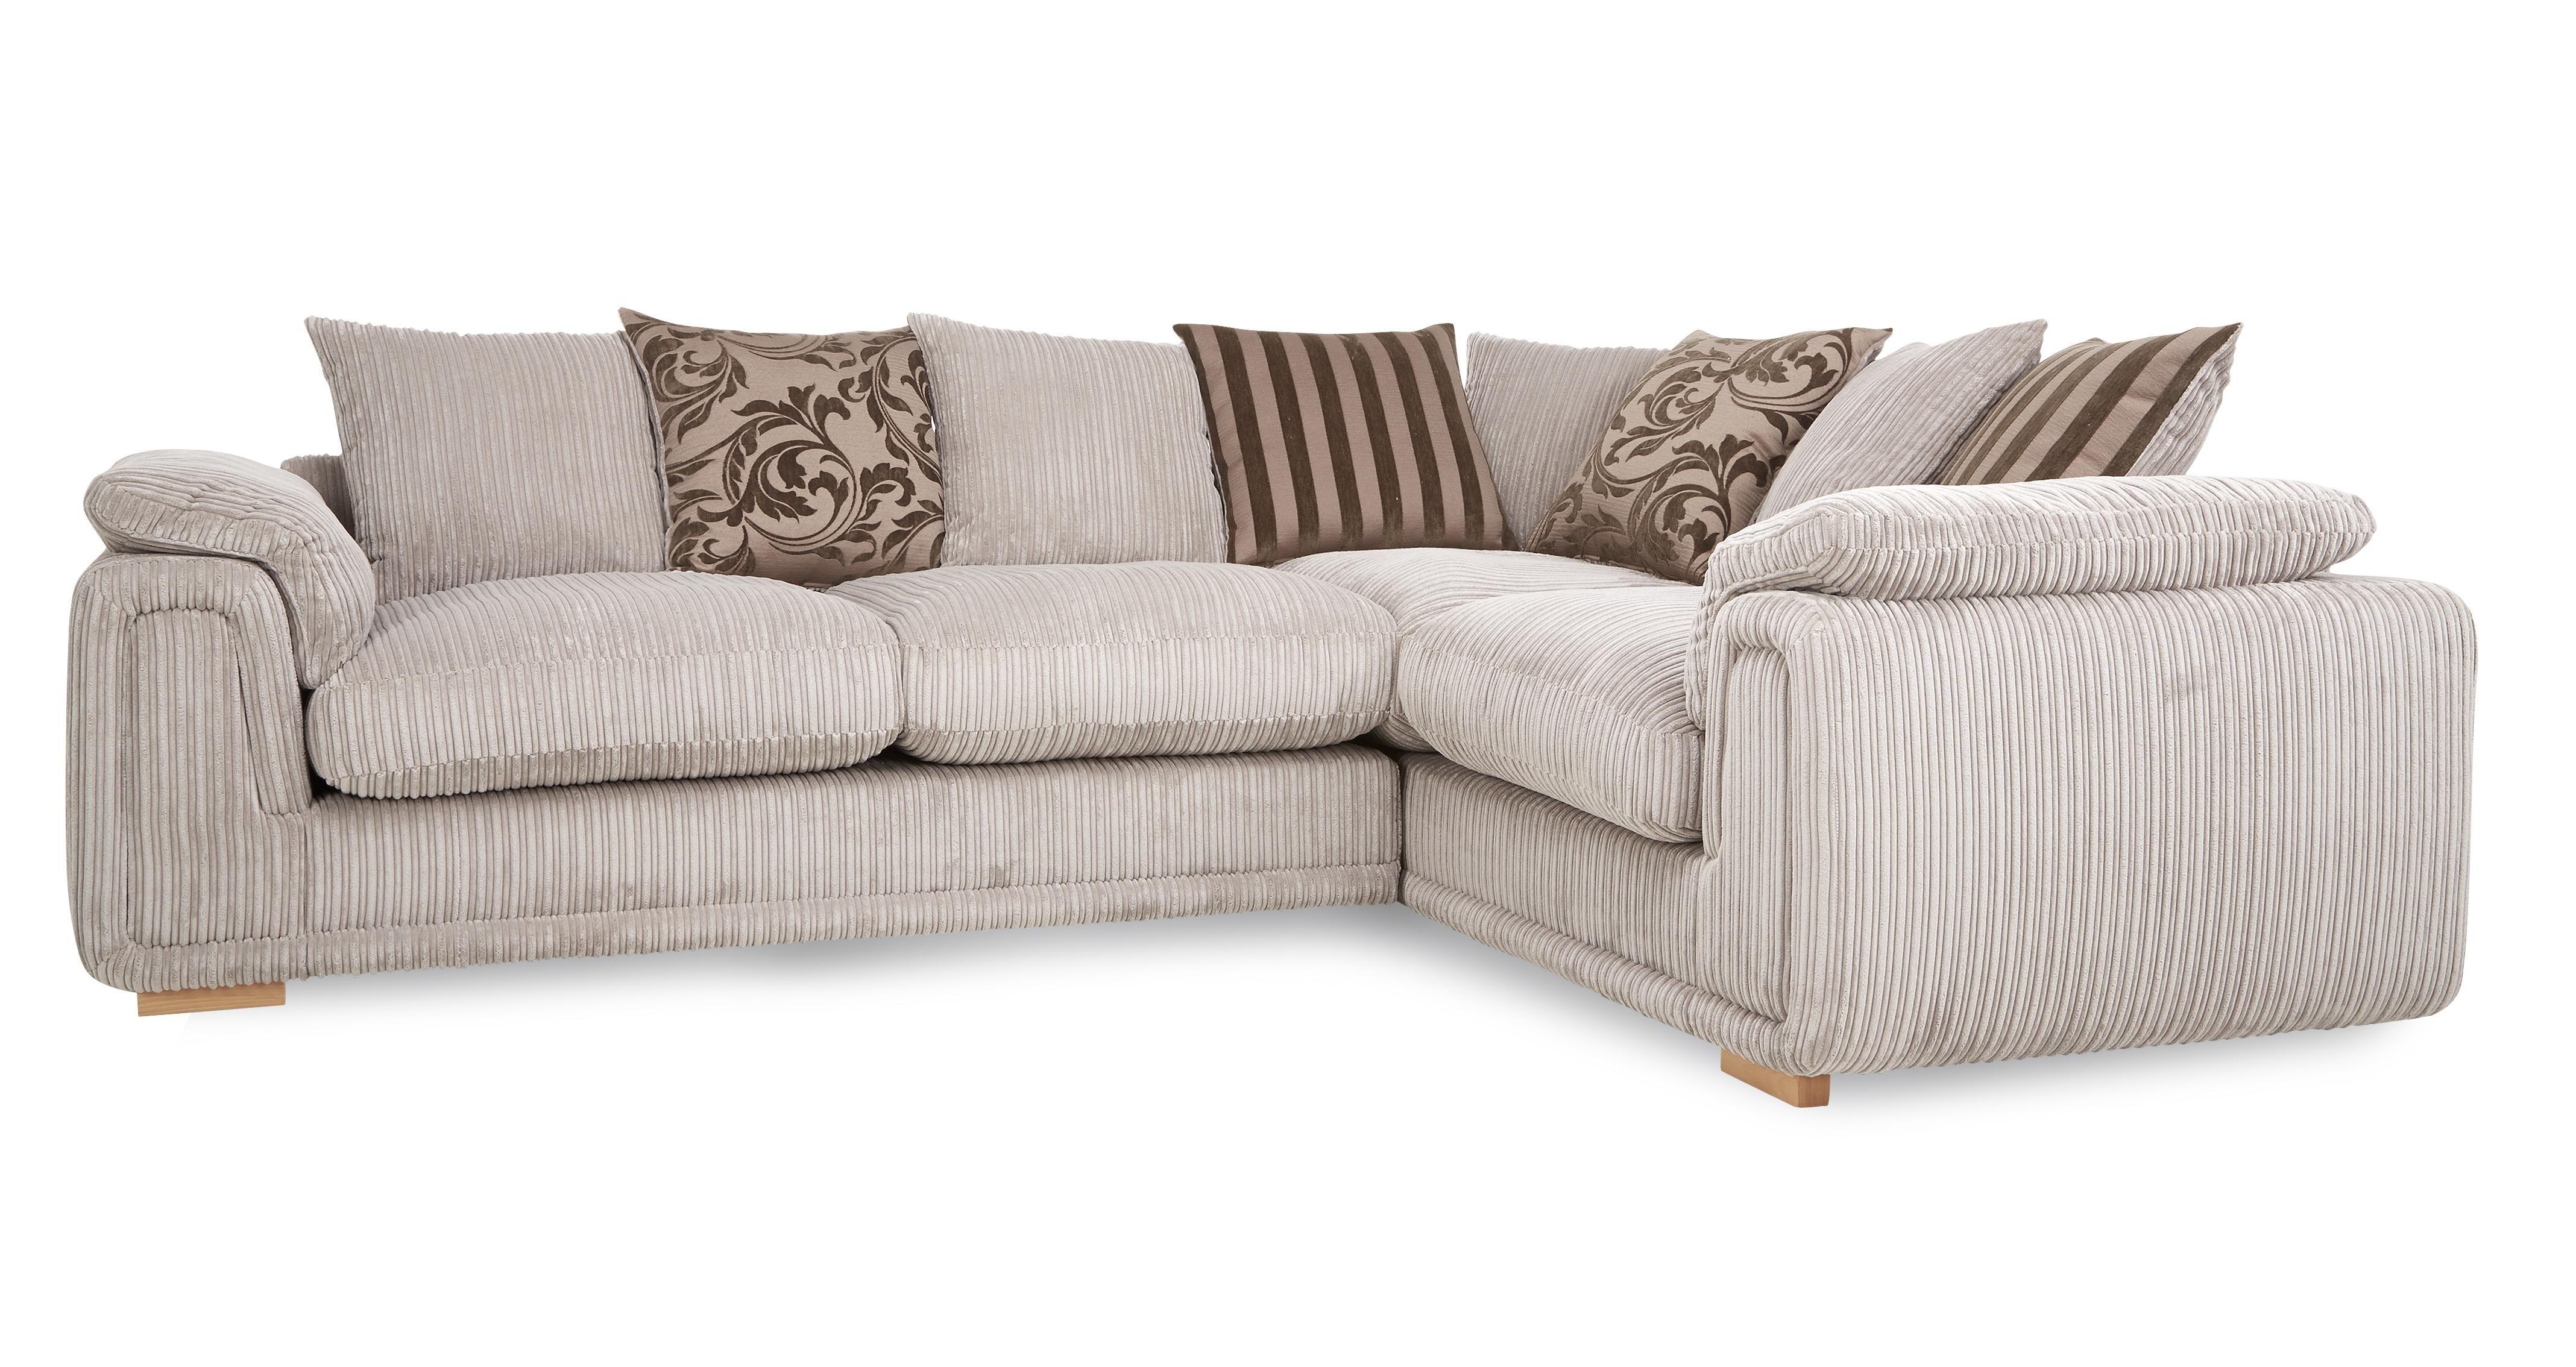 squashy sofas uk white leather chesterfield sofa lottie left arm facing 2 seater pillow back corner